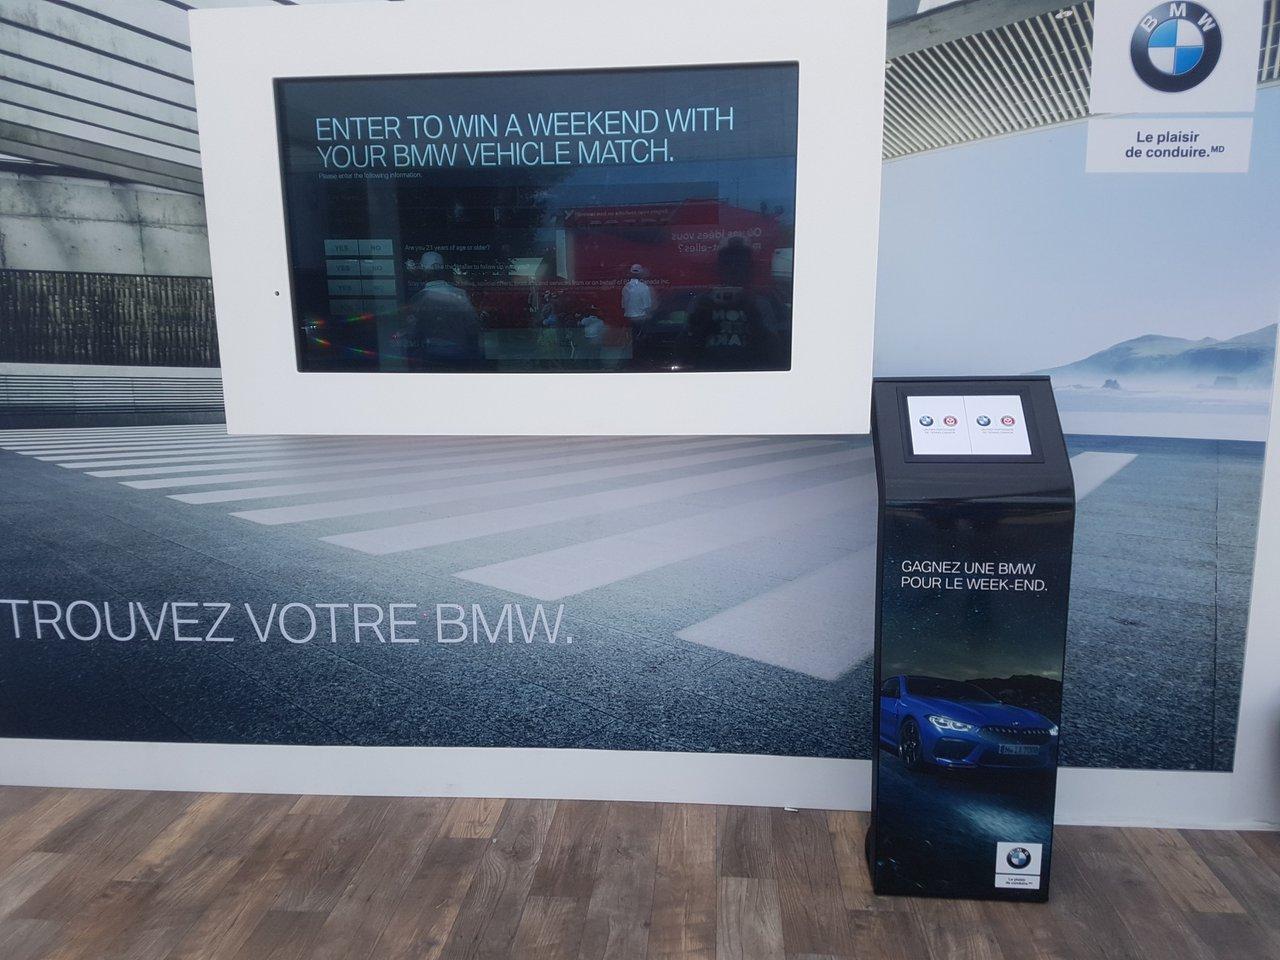 BMW Matchmaker Digital Interactive Game photo 20190804_151113.jpg